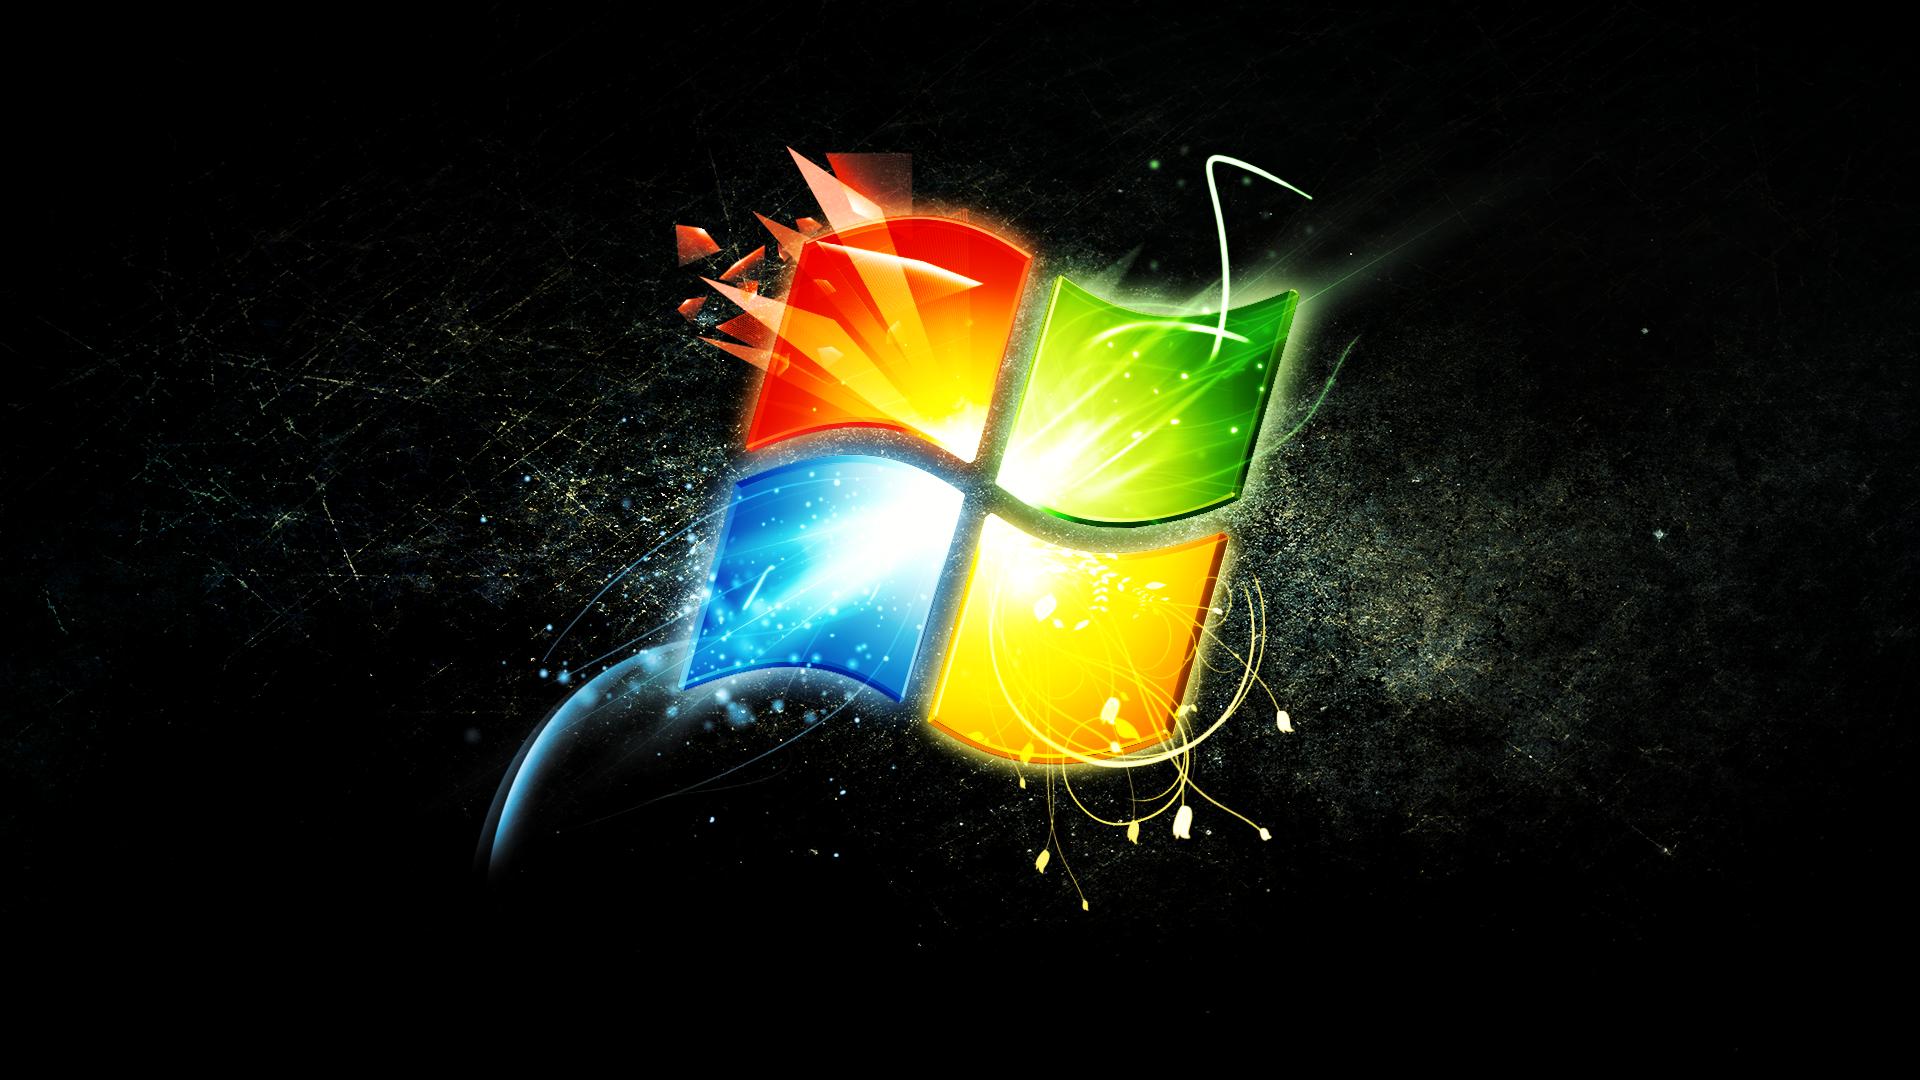 Windows Original (Wallpaper) by Hardii